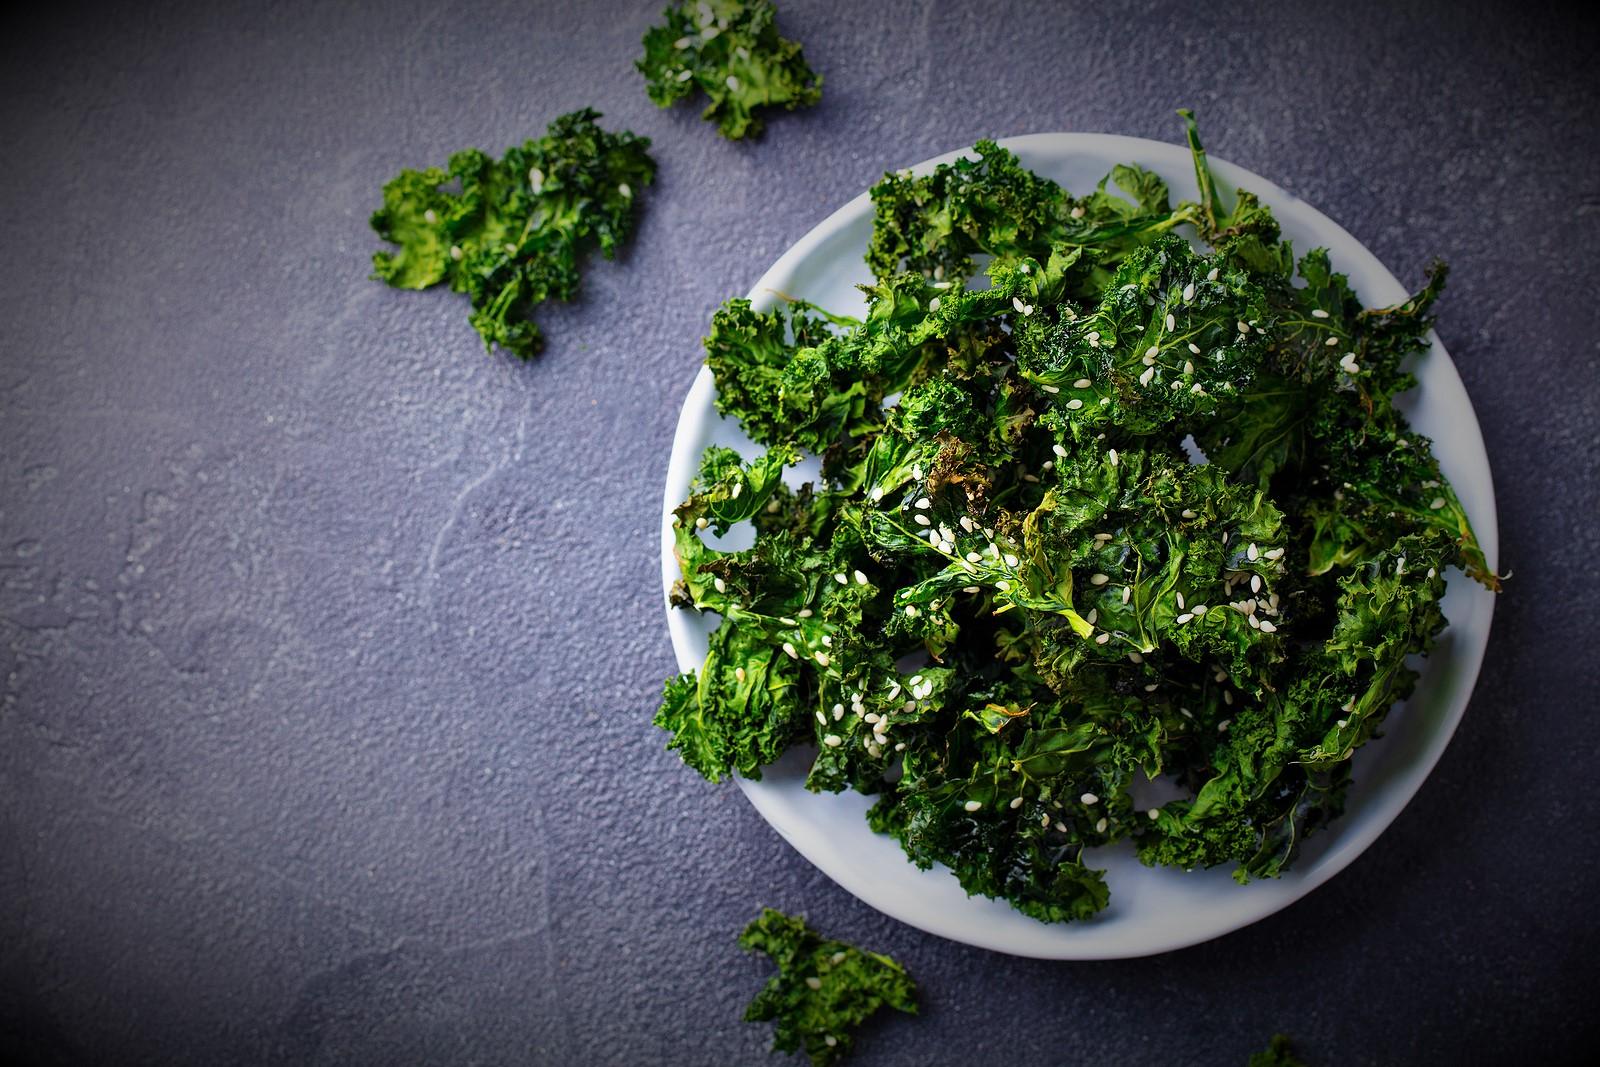 kale chips 1.jpg